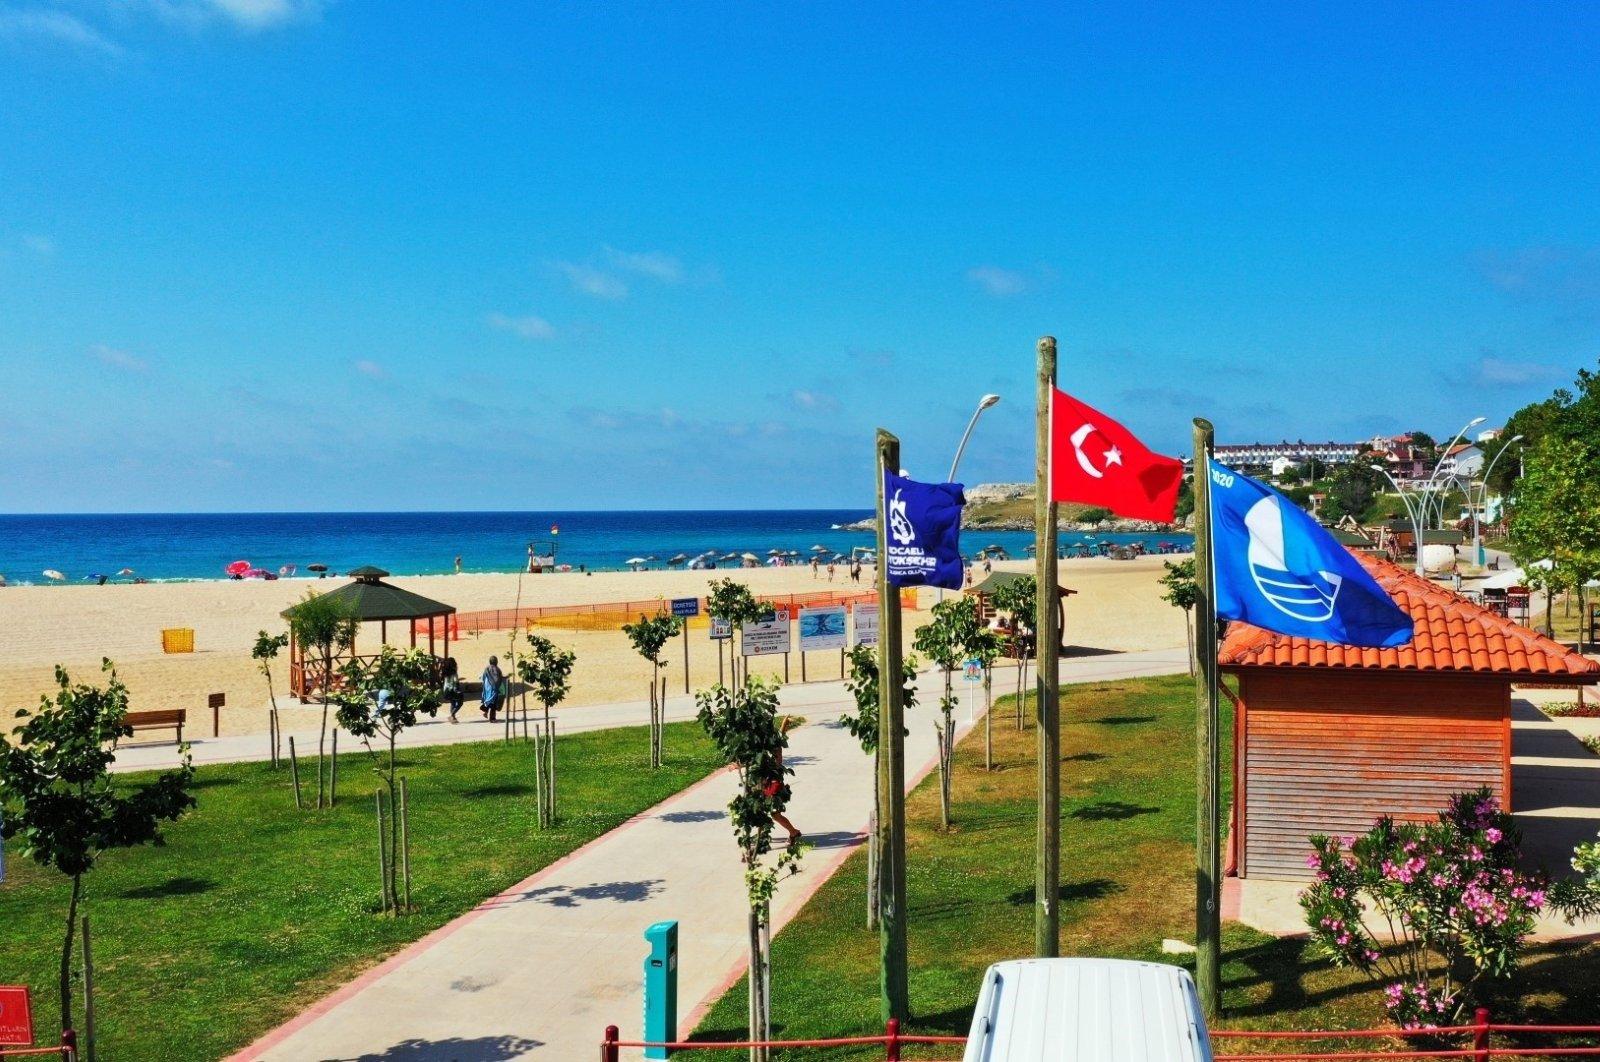 A beach awarded with the Blue Flag in Kocaeli, Turkey, May 20, 2021. (IHA Photo)